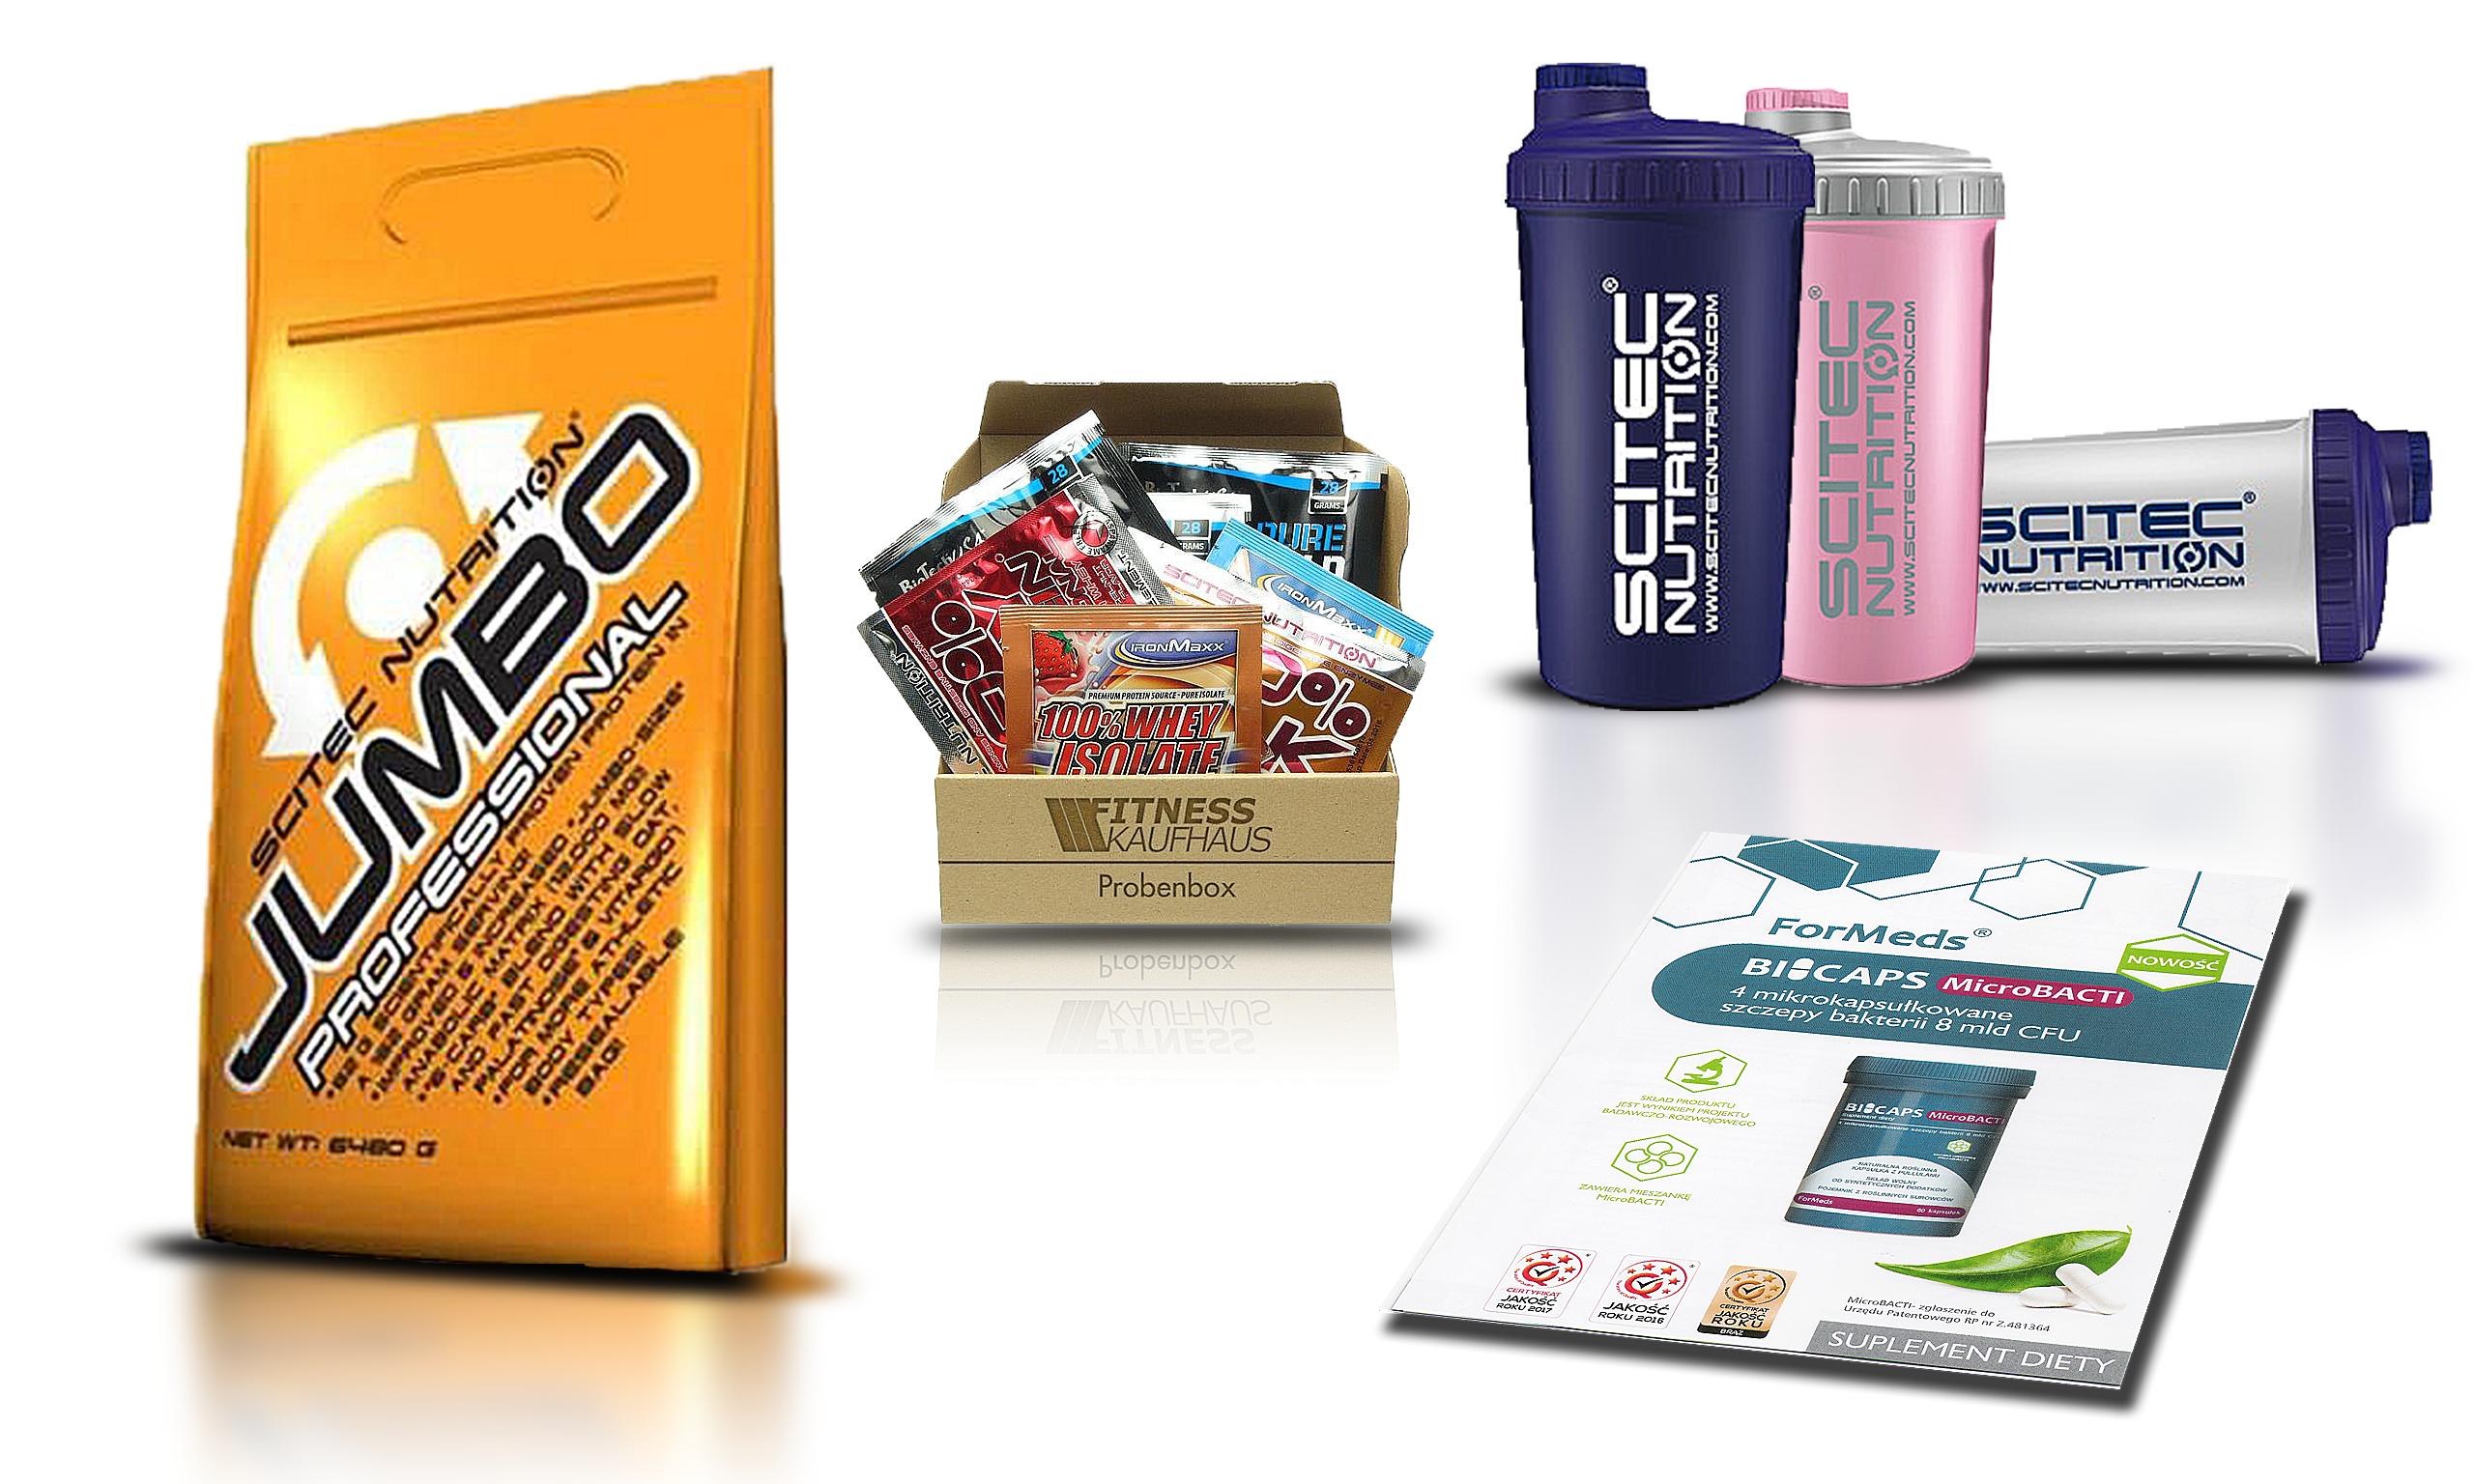 Zdjecia Olimpiafit Scitec Jumbo Professional 6480g Sh Probki Poradn Scitec Nutrition Diety Convenience Store Products